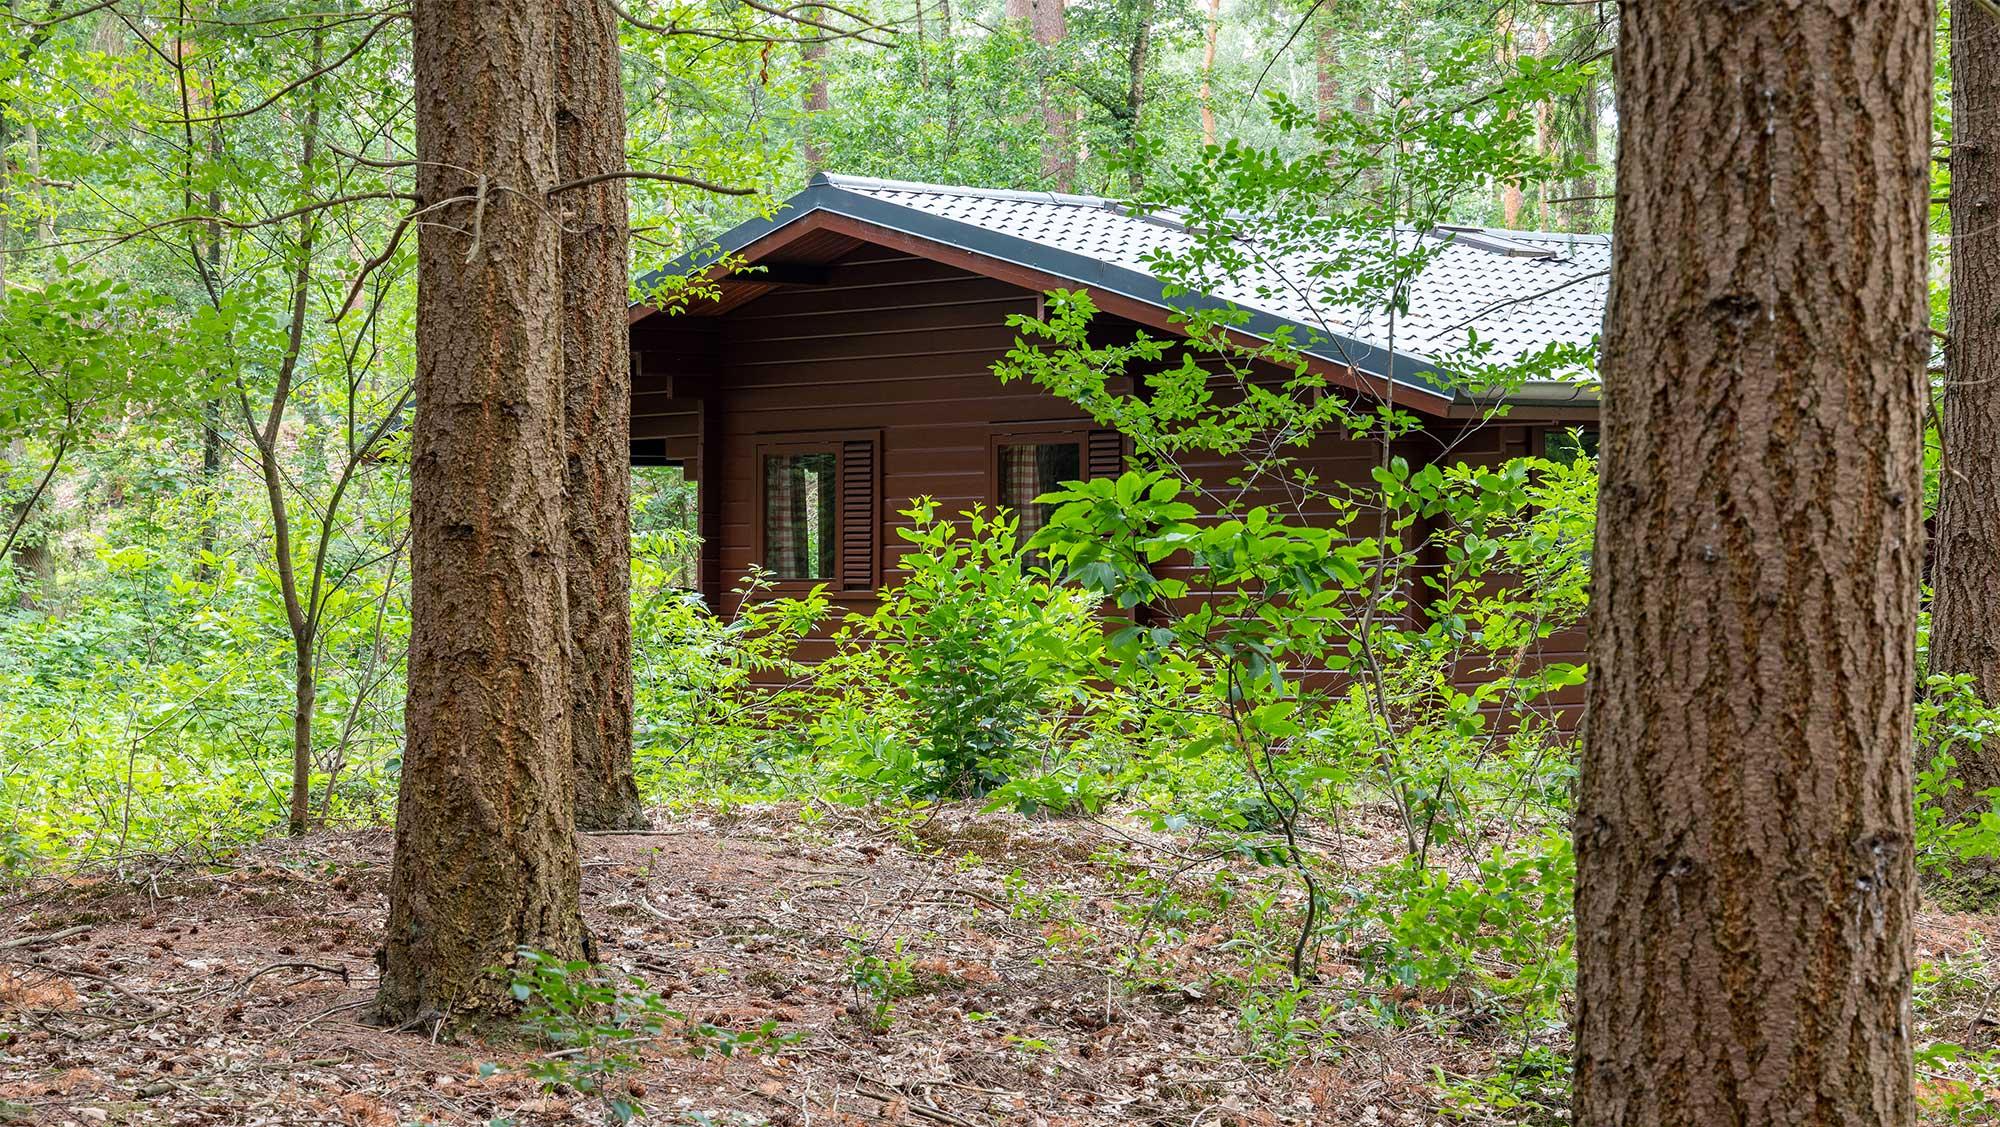 4pers bungalow Finse Molecaten Park Landgoed Ginkelduin 01